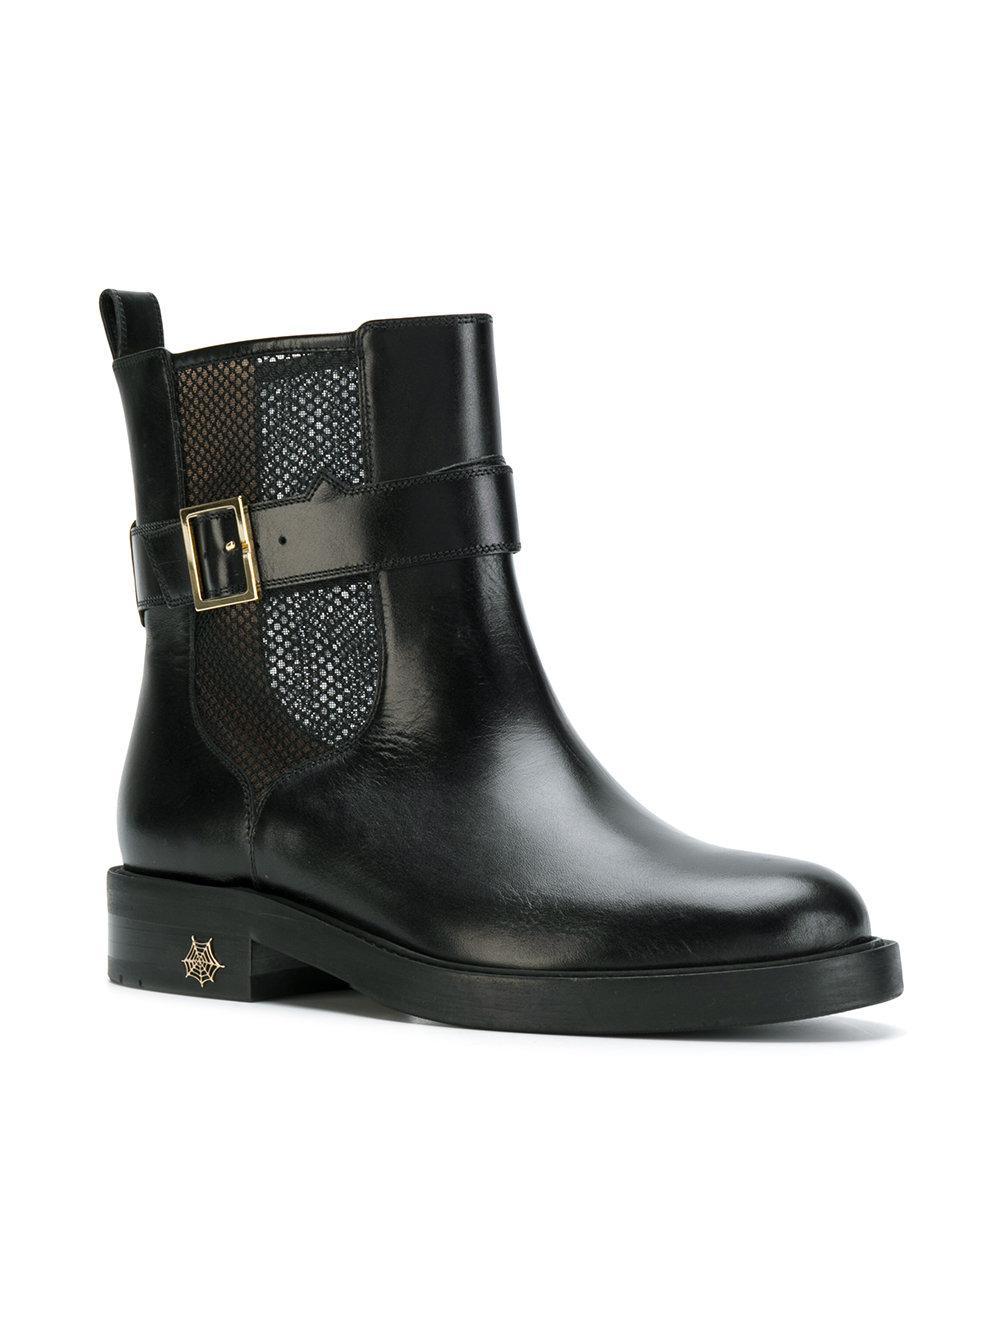 Charlotte Olympia Mesh insert boots byQd1Gnk